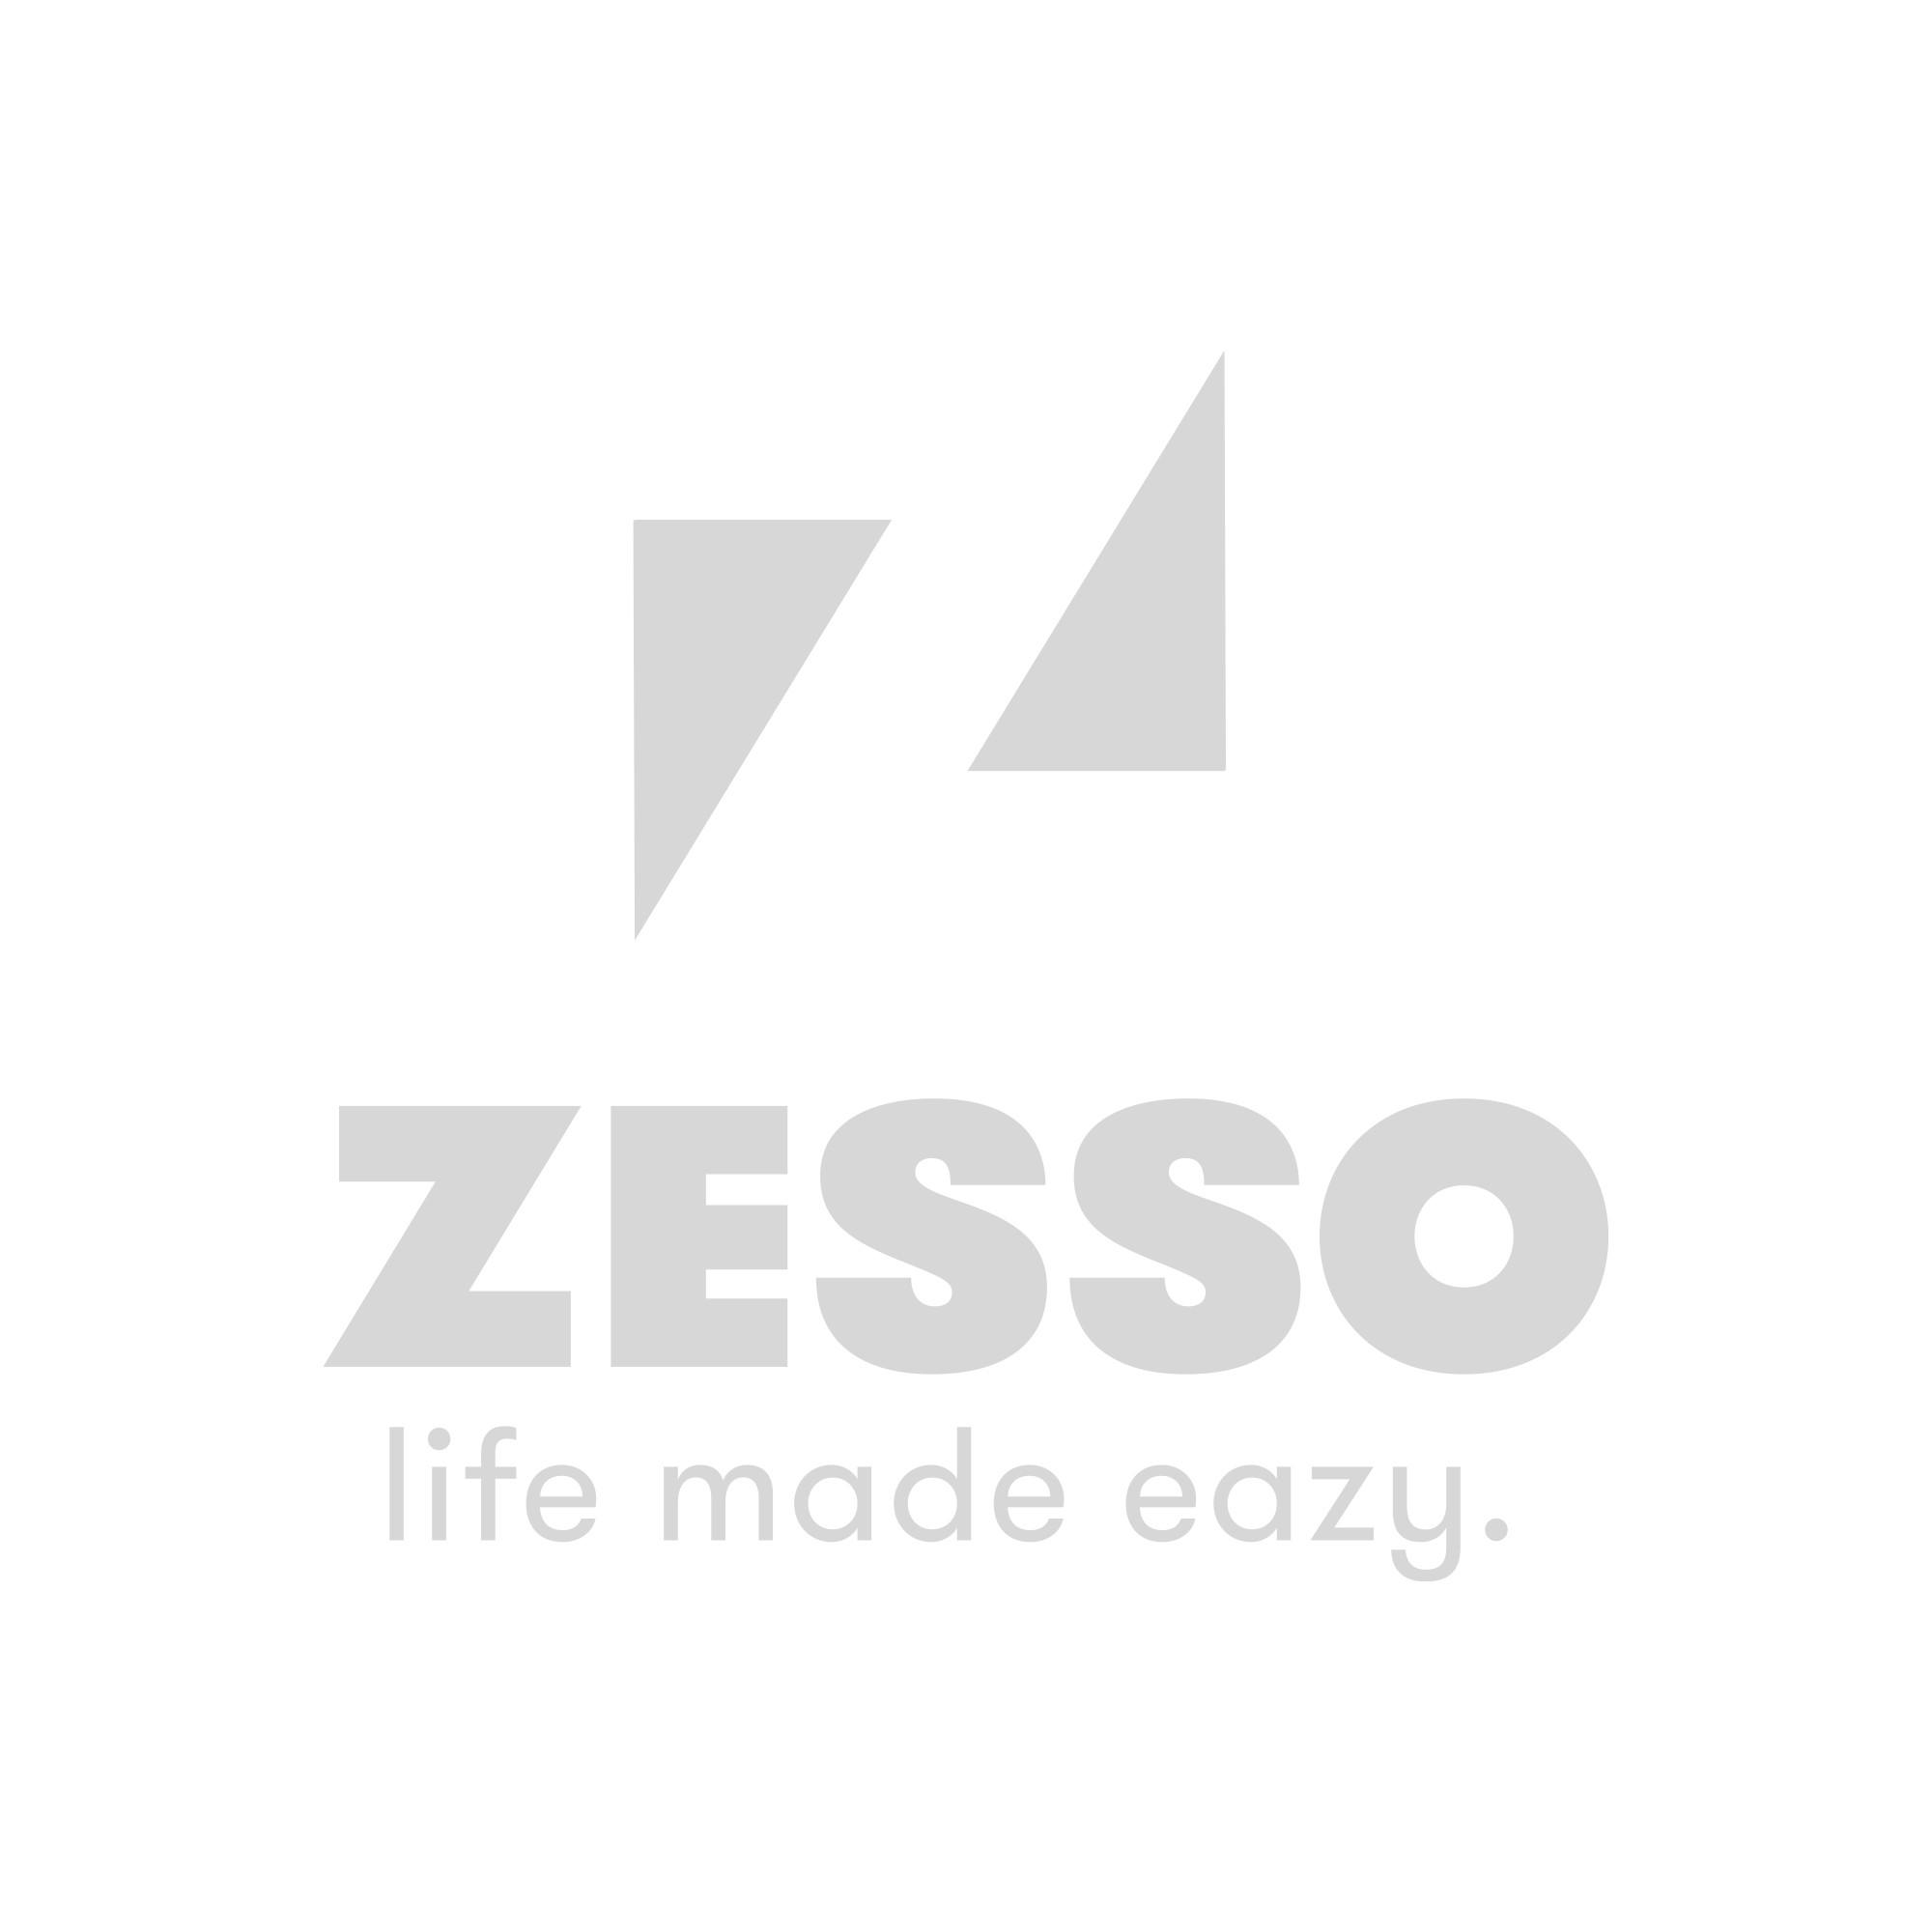 DecoToday Dekbedovertrek Little Black Dress 140 cm x 200 cm